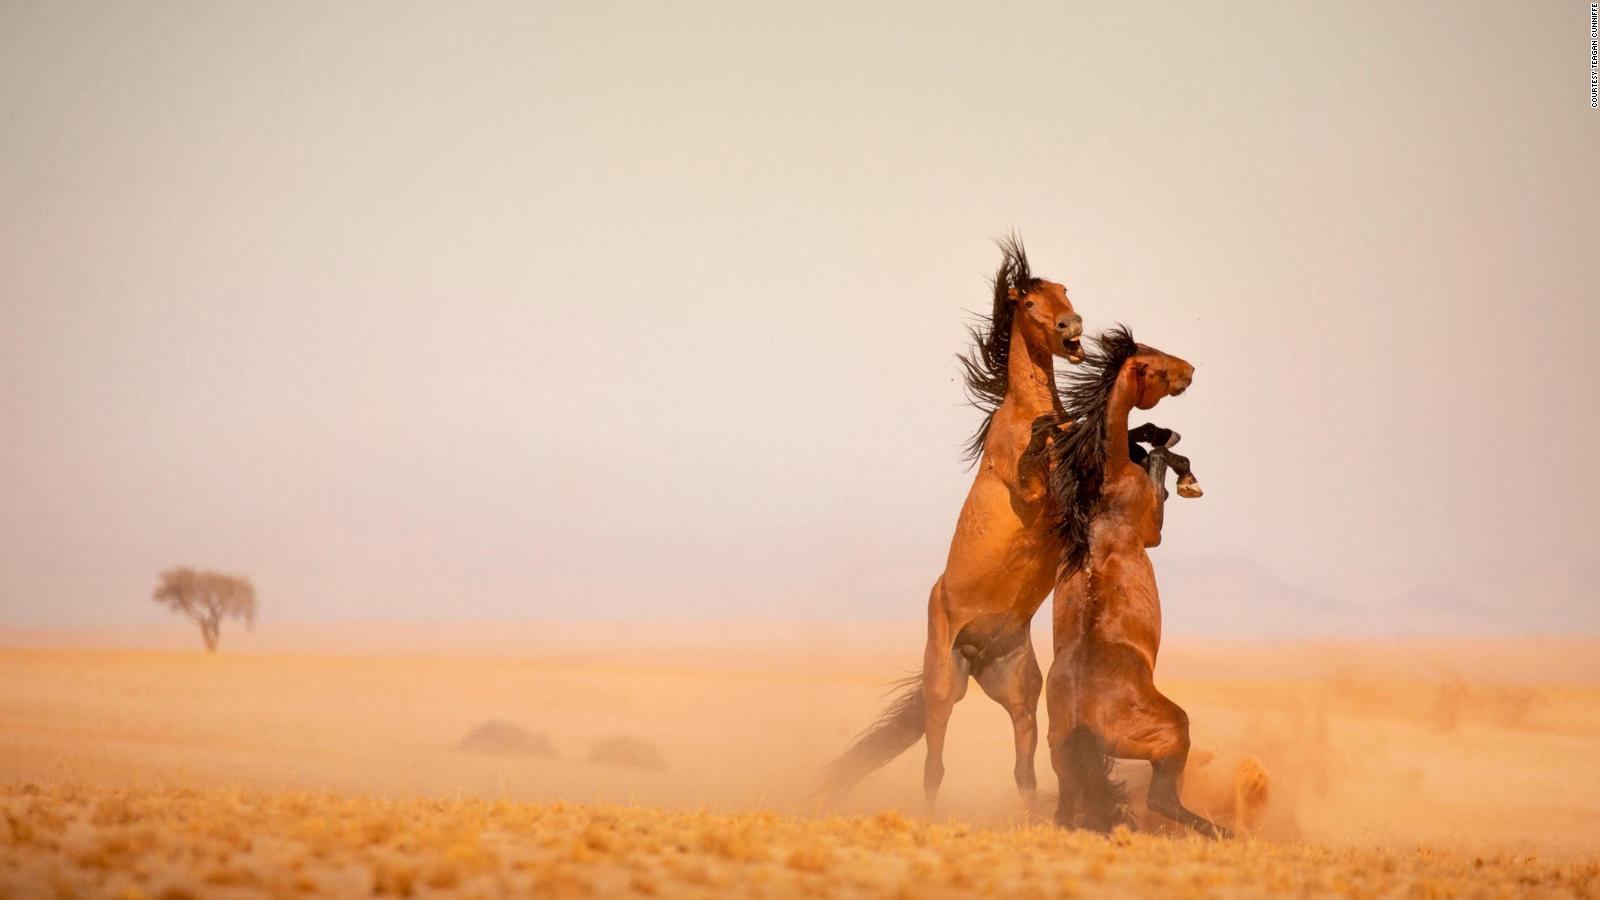 Namibia S Last Wild Horses Face Perilous Future Cnn Travel